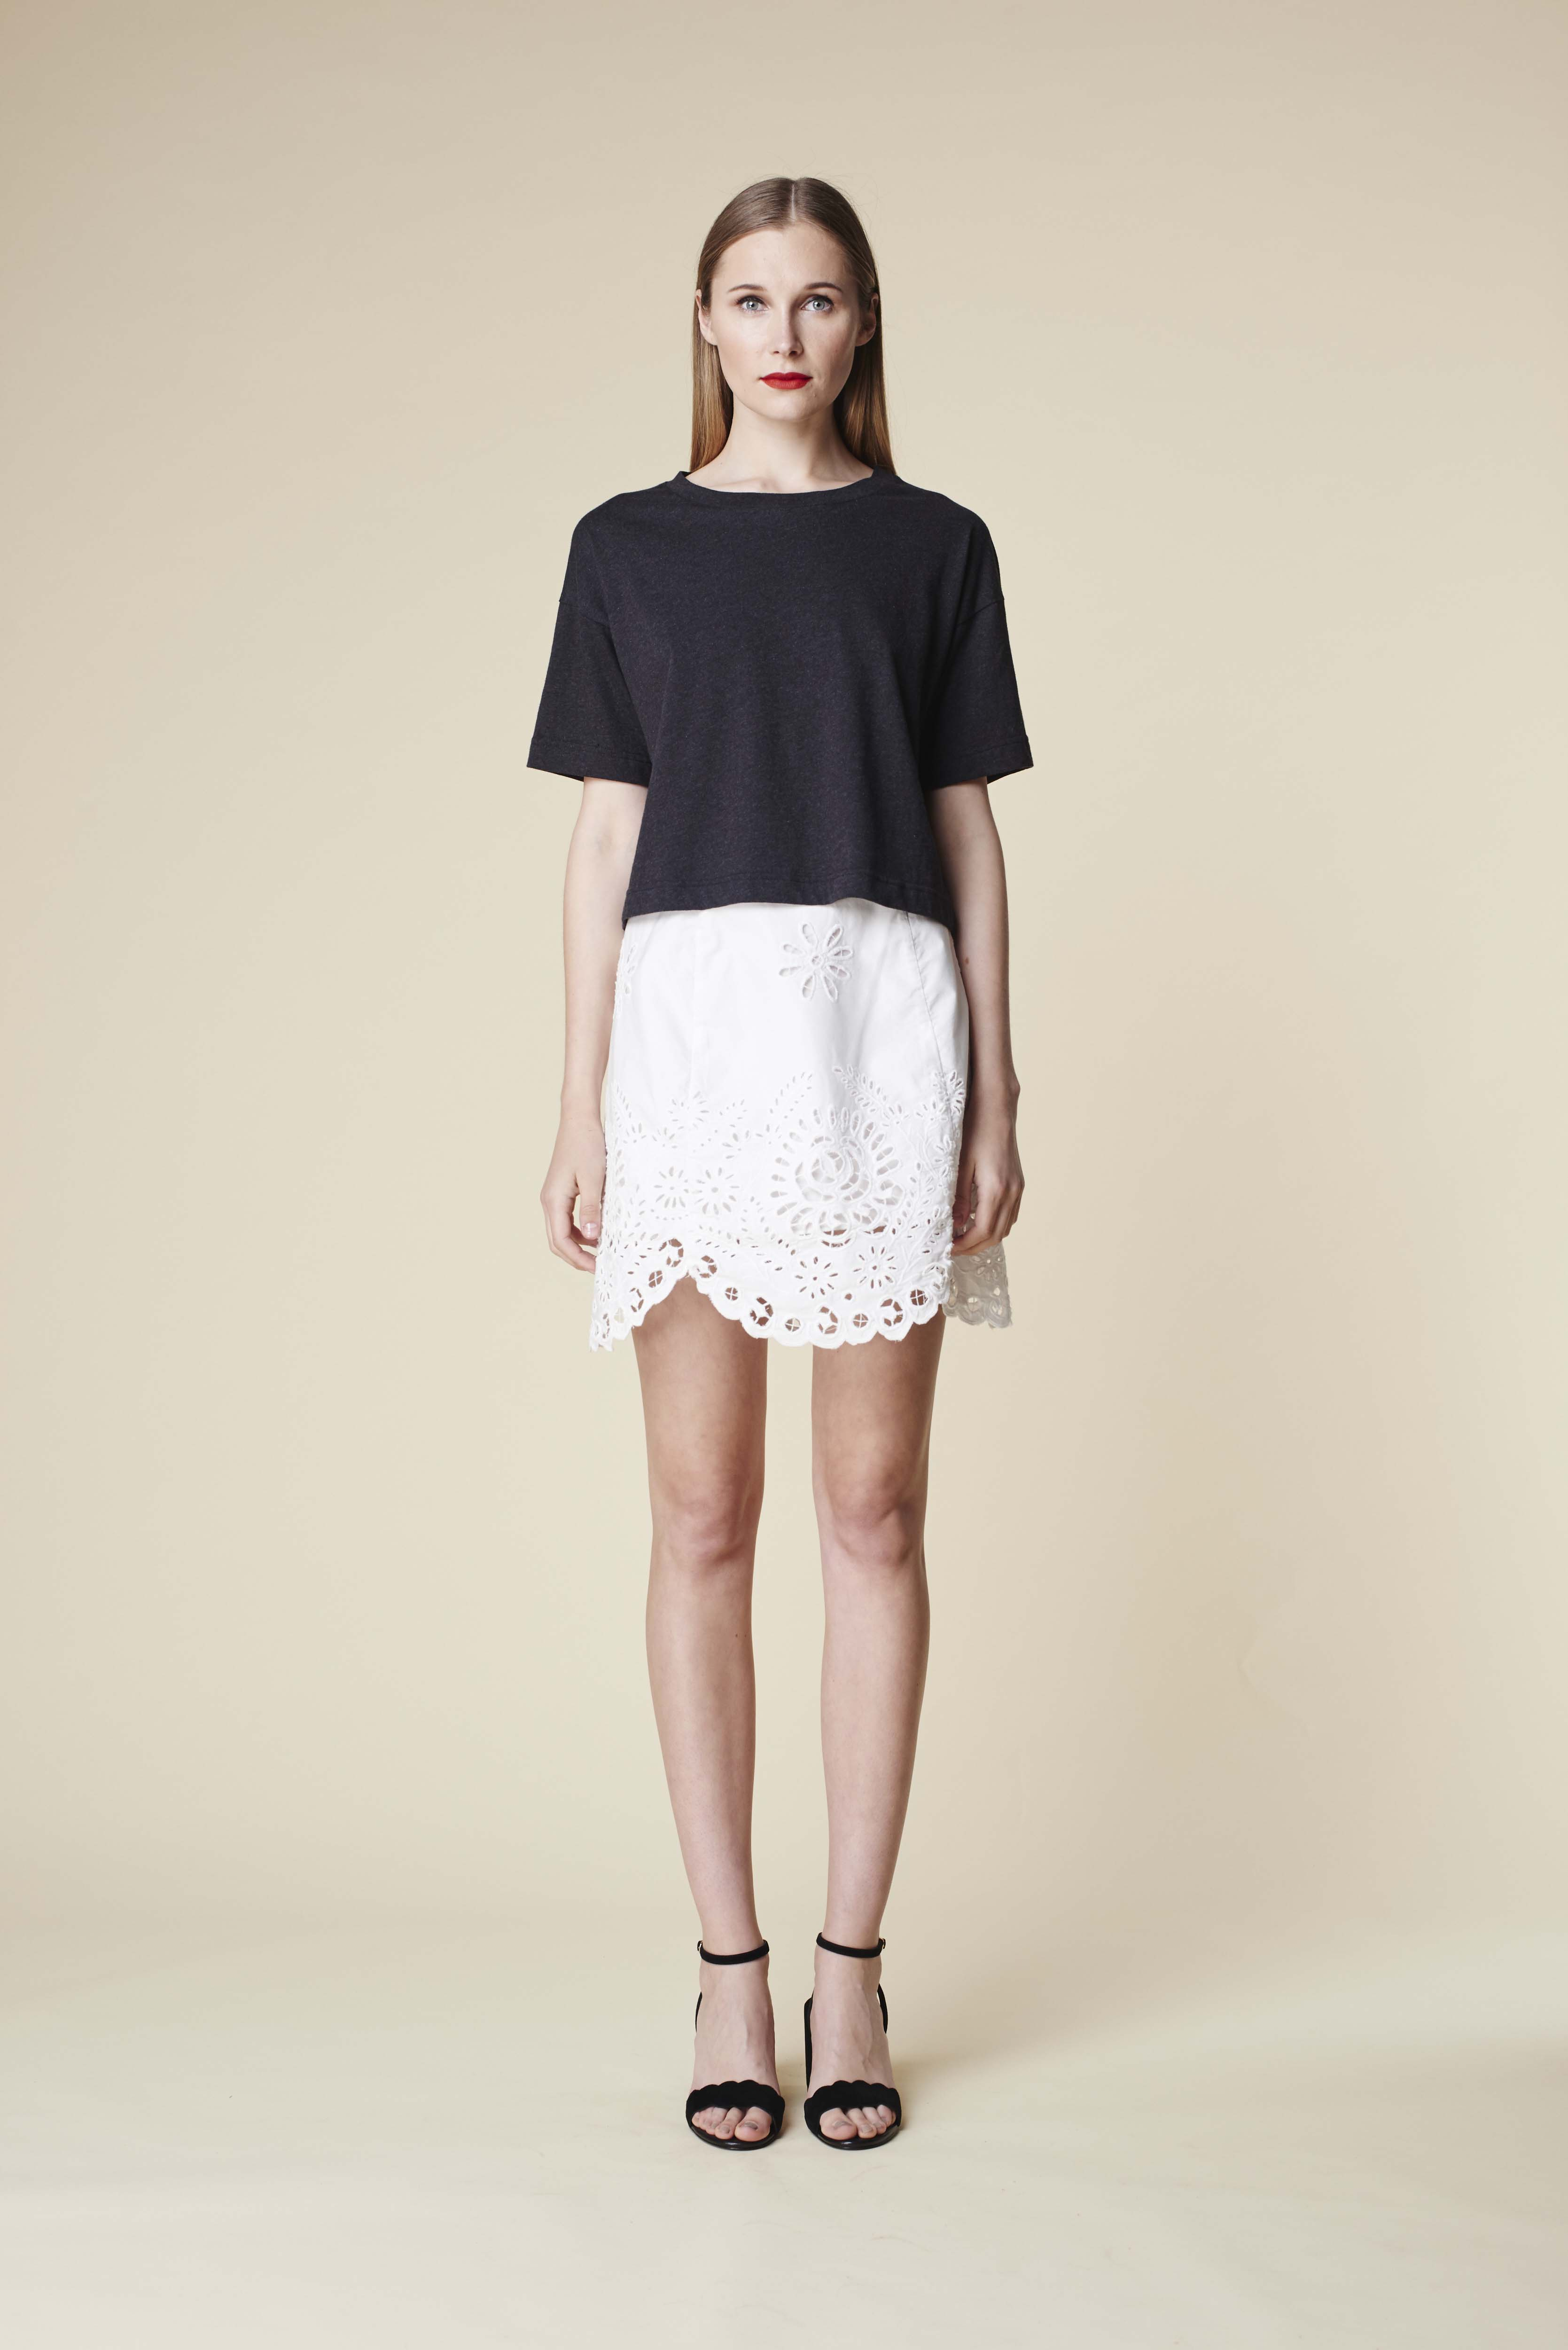 RUBY Zora T-Shirt, Aloe Skirt & Lila Heel